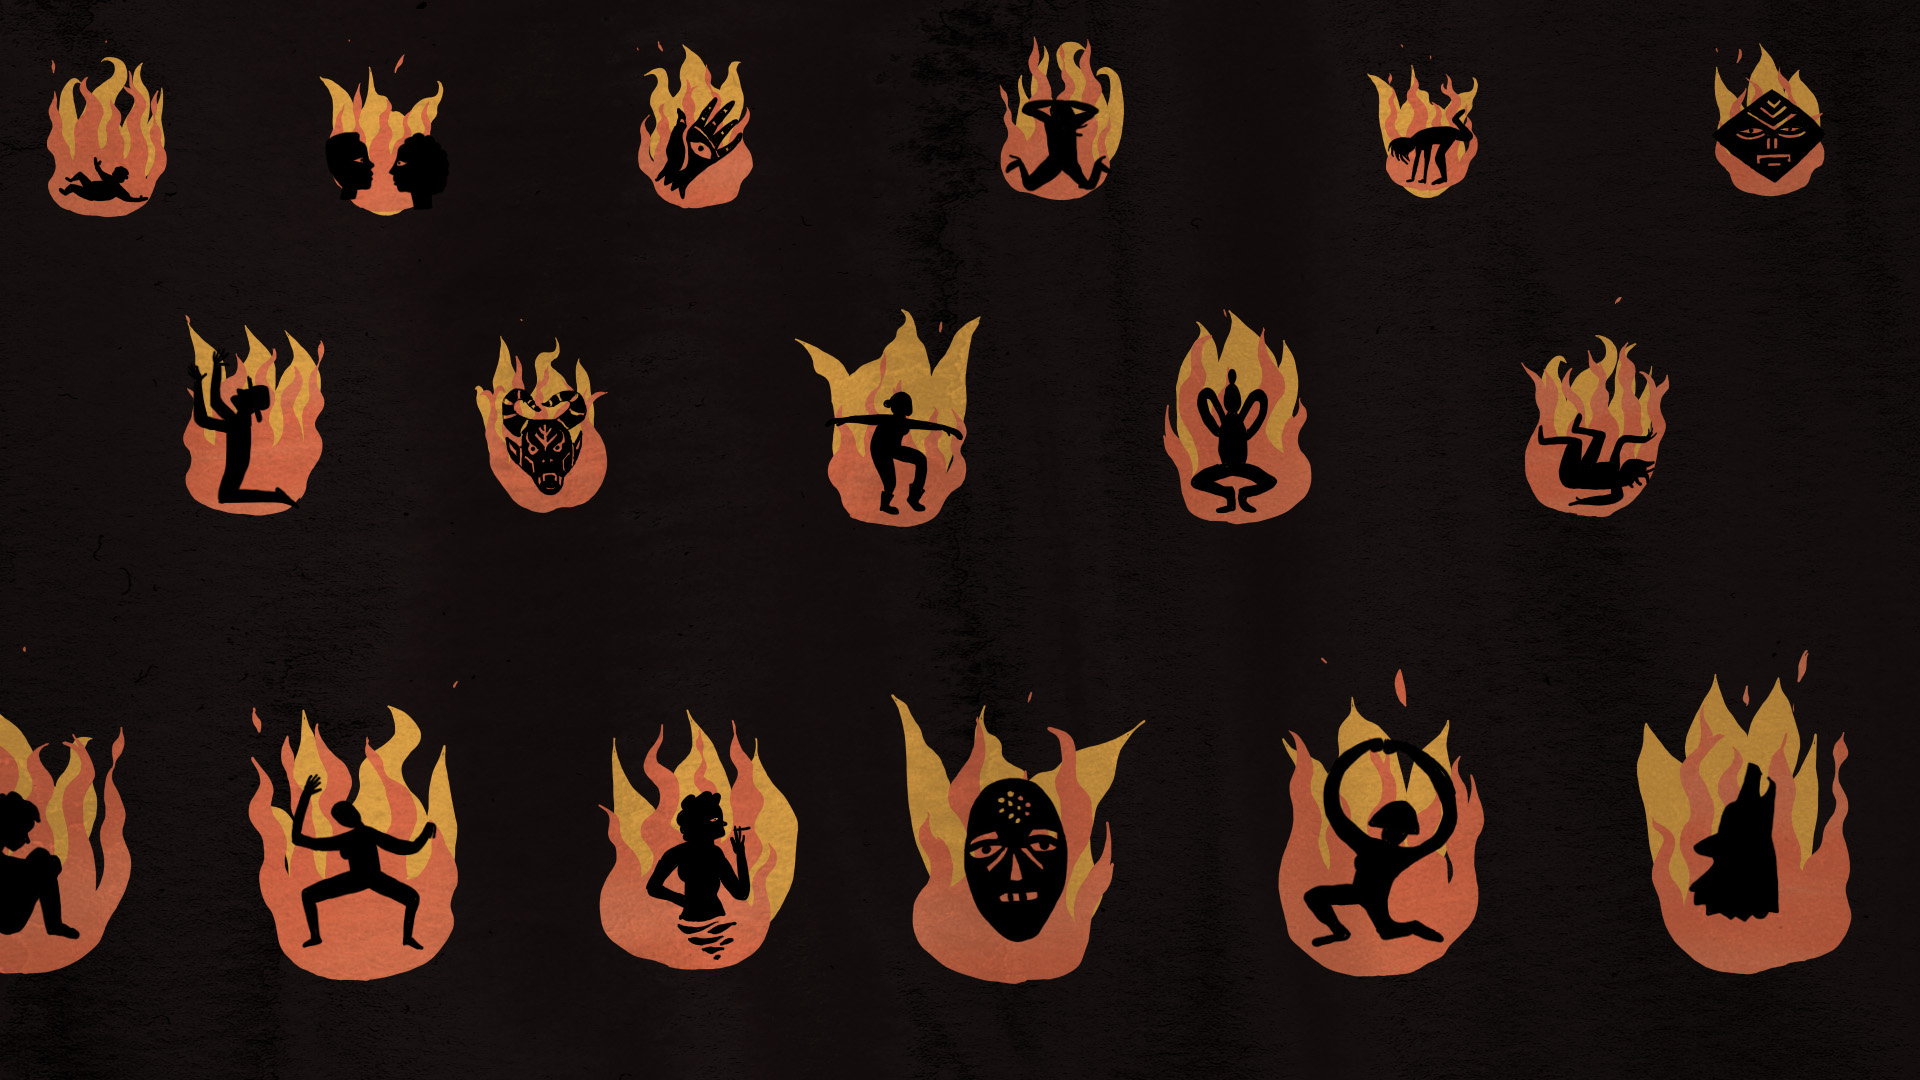 FlameFigures.jpg